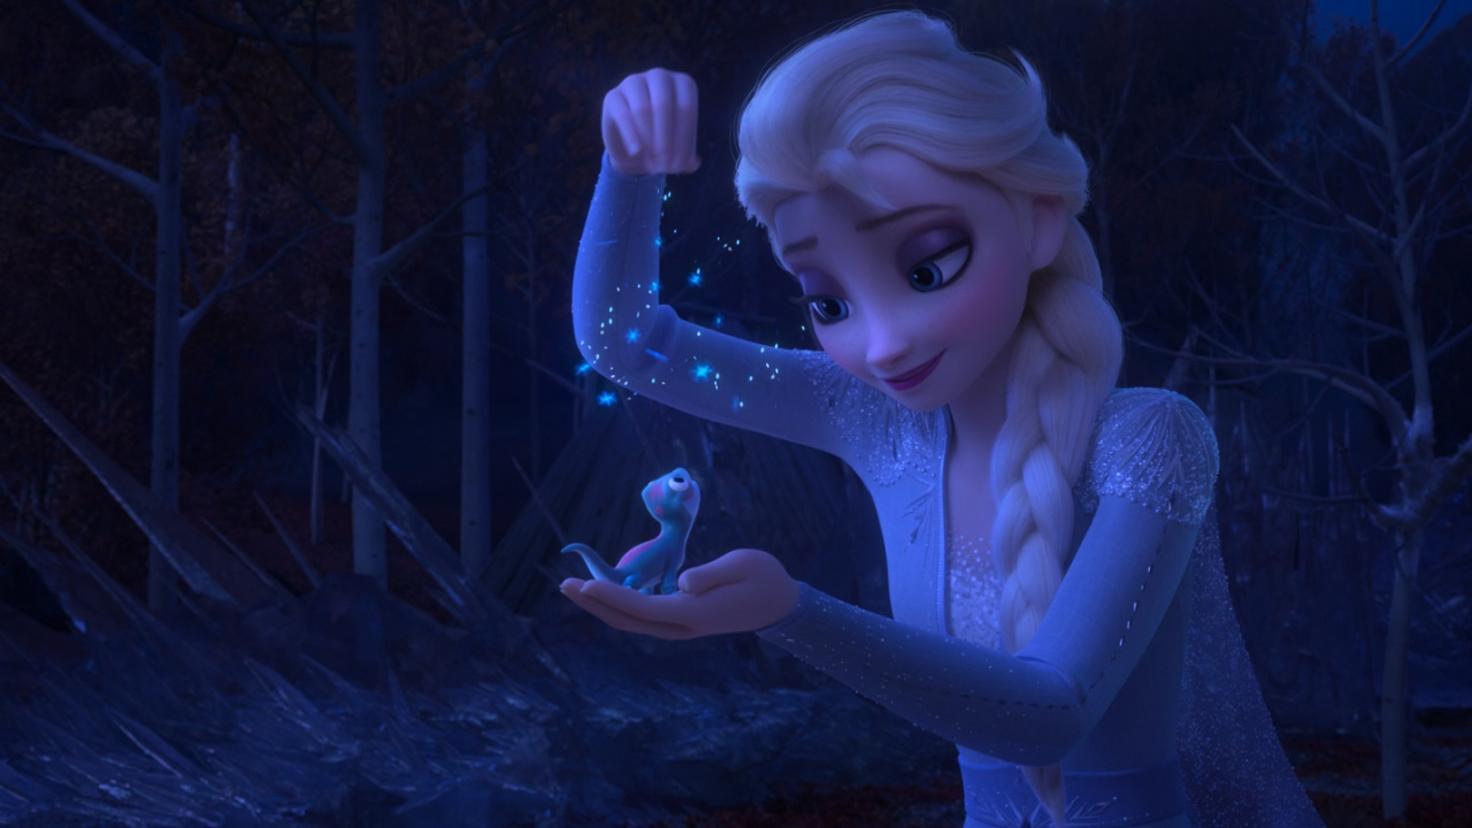 The Frozen 2 Elsa